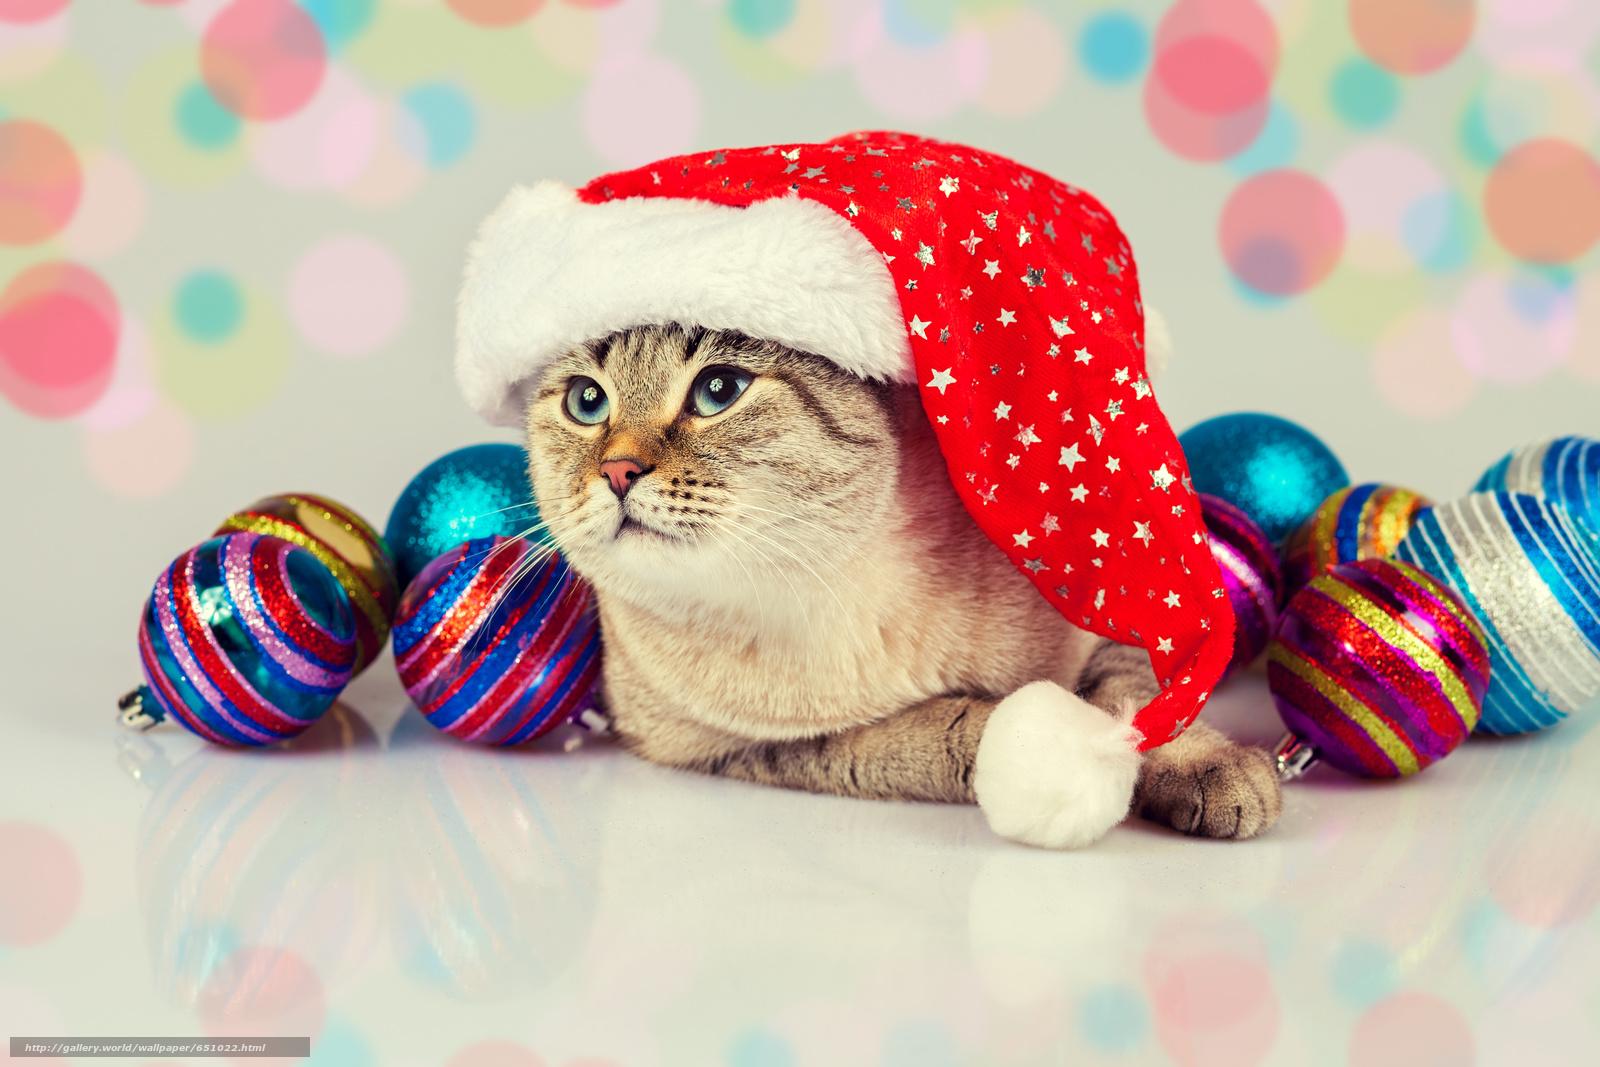 Download wallpaper COTE,  cat,  cap,  Balls free desktop wallpaper in the resolution 5616x3744 — picture №651022